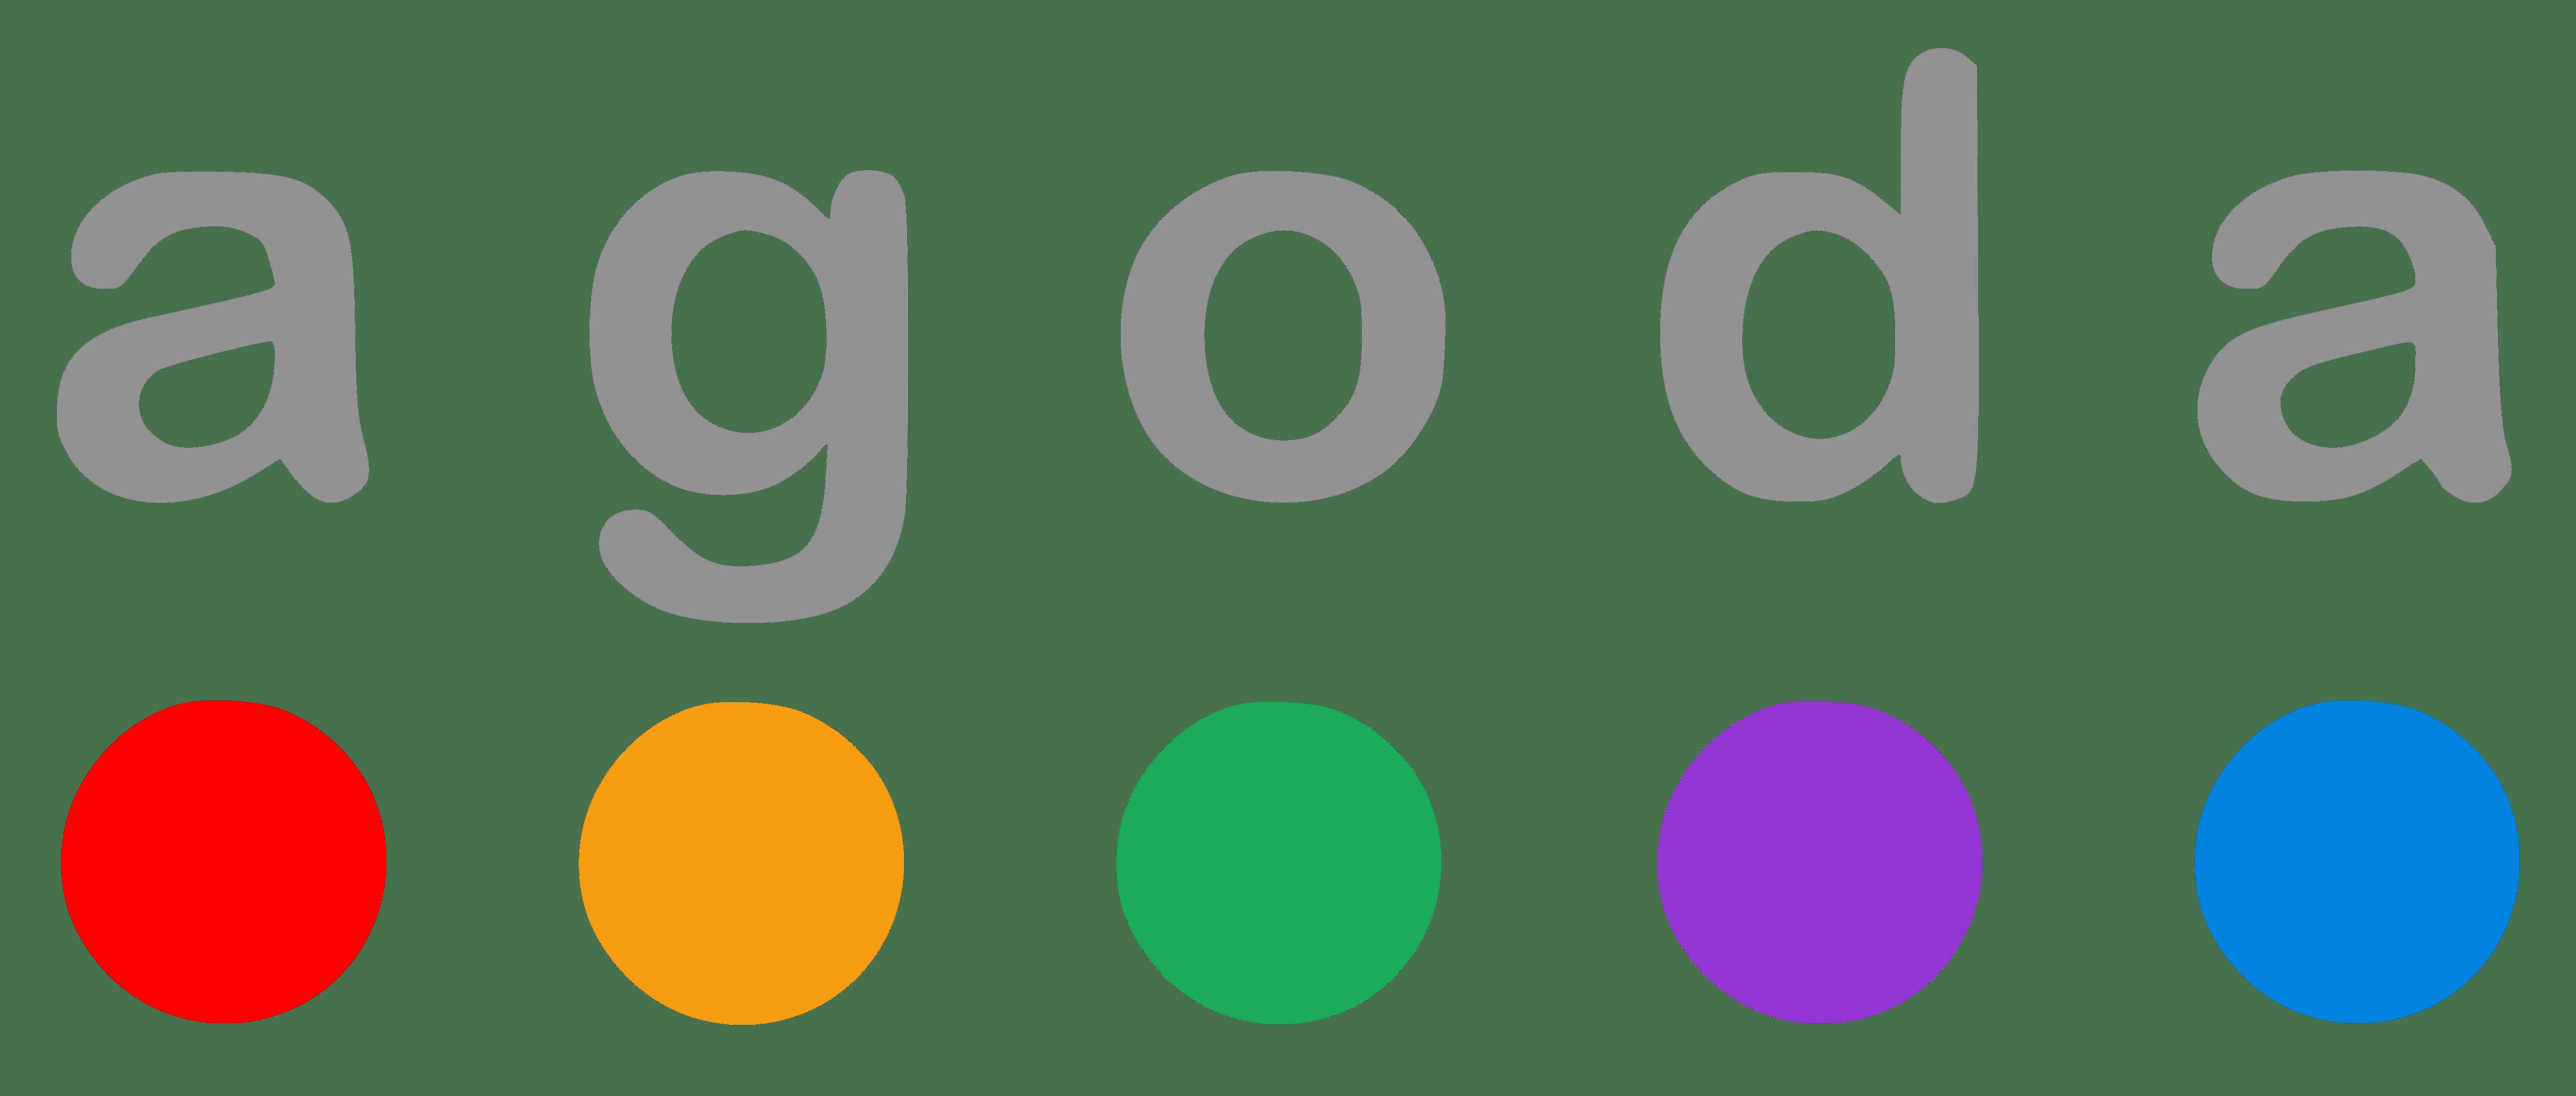 agoda logo 2